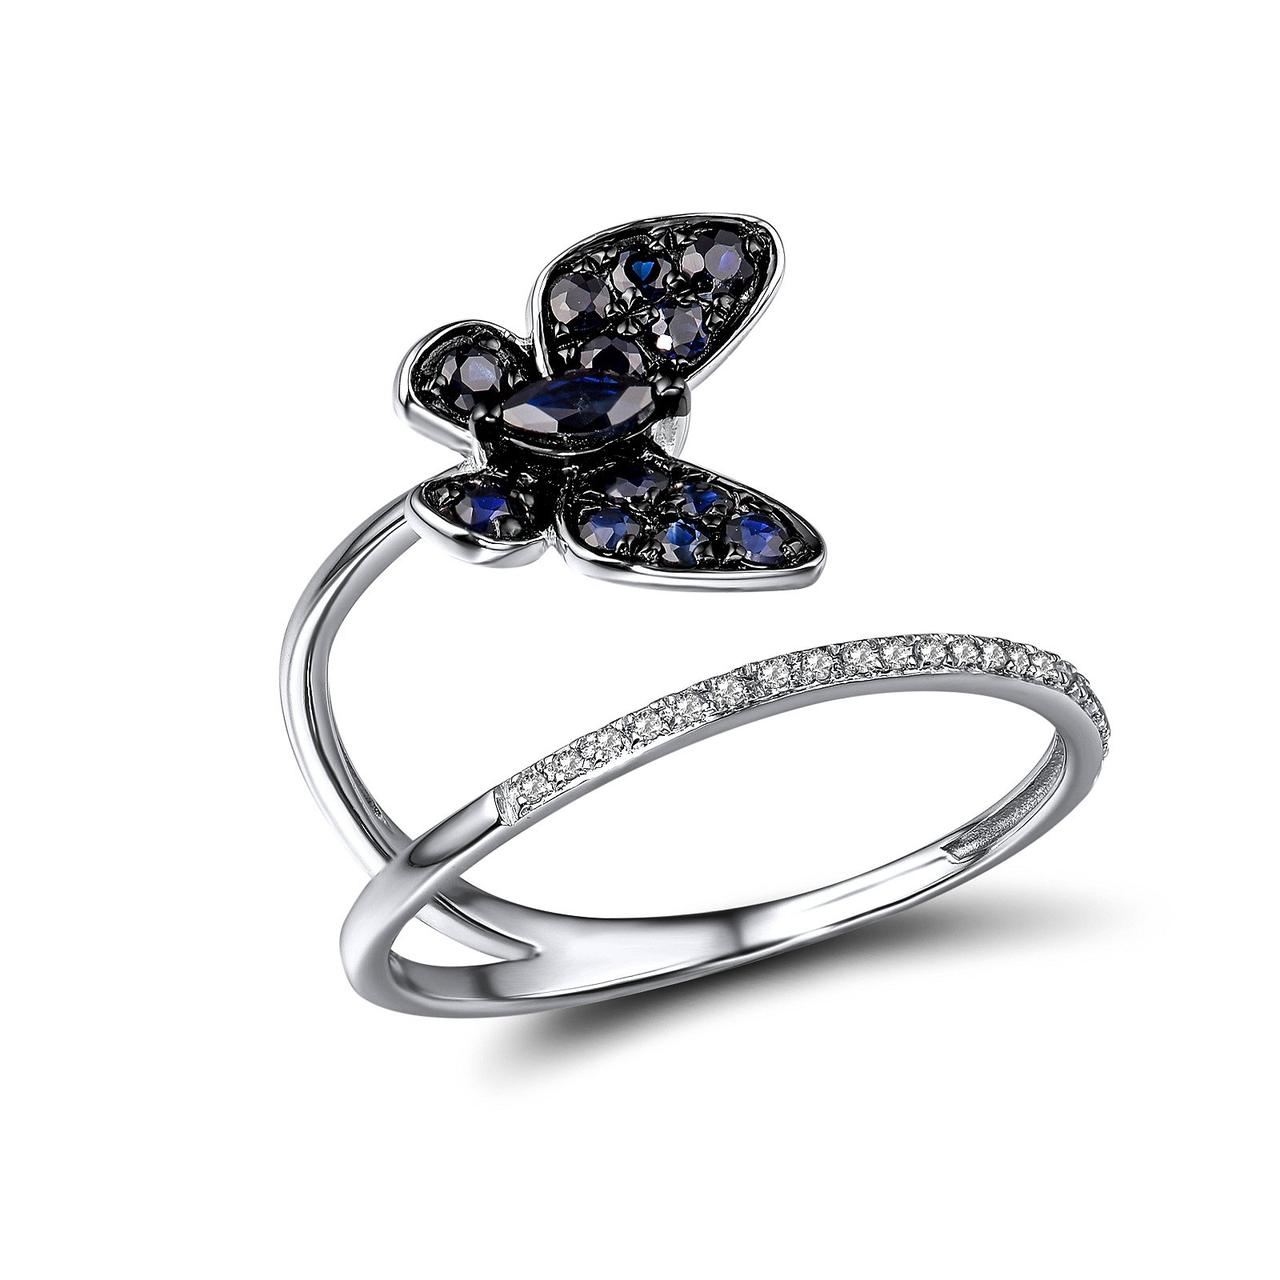 Золотое кольцо с бриллиантами и сапфирами, размер 17 (1719053)